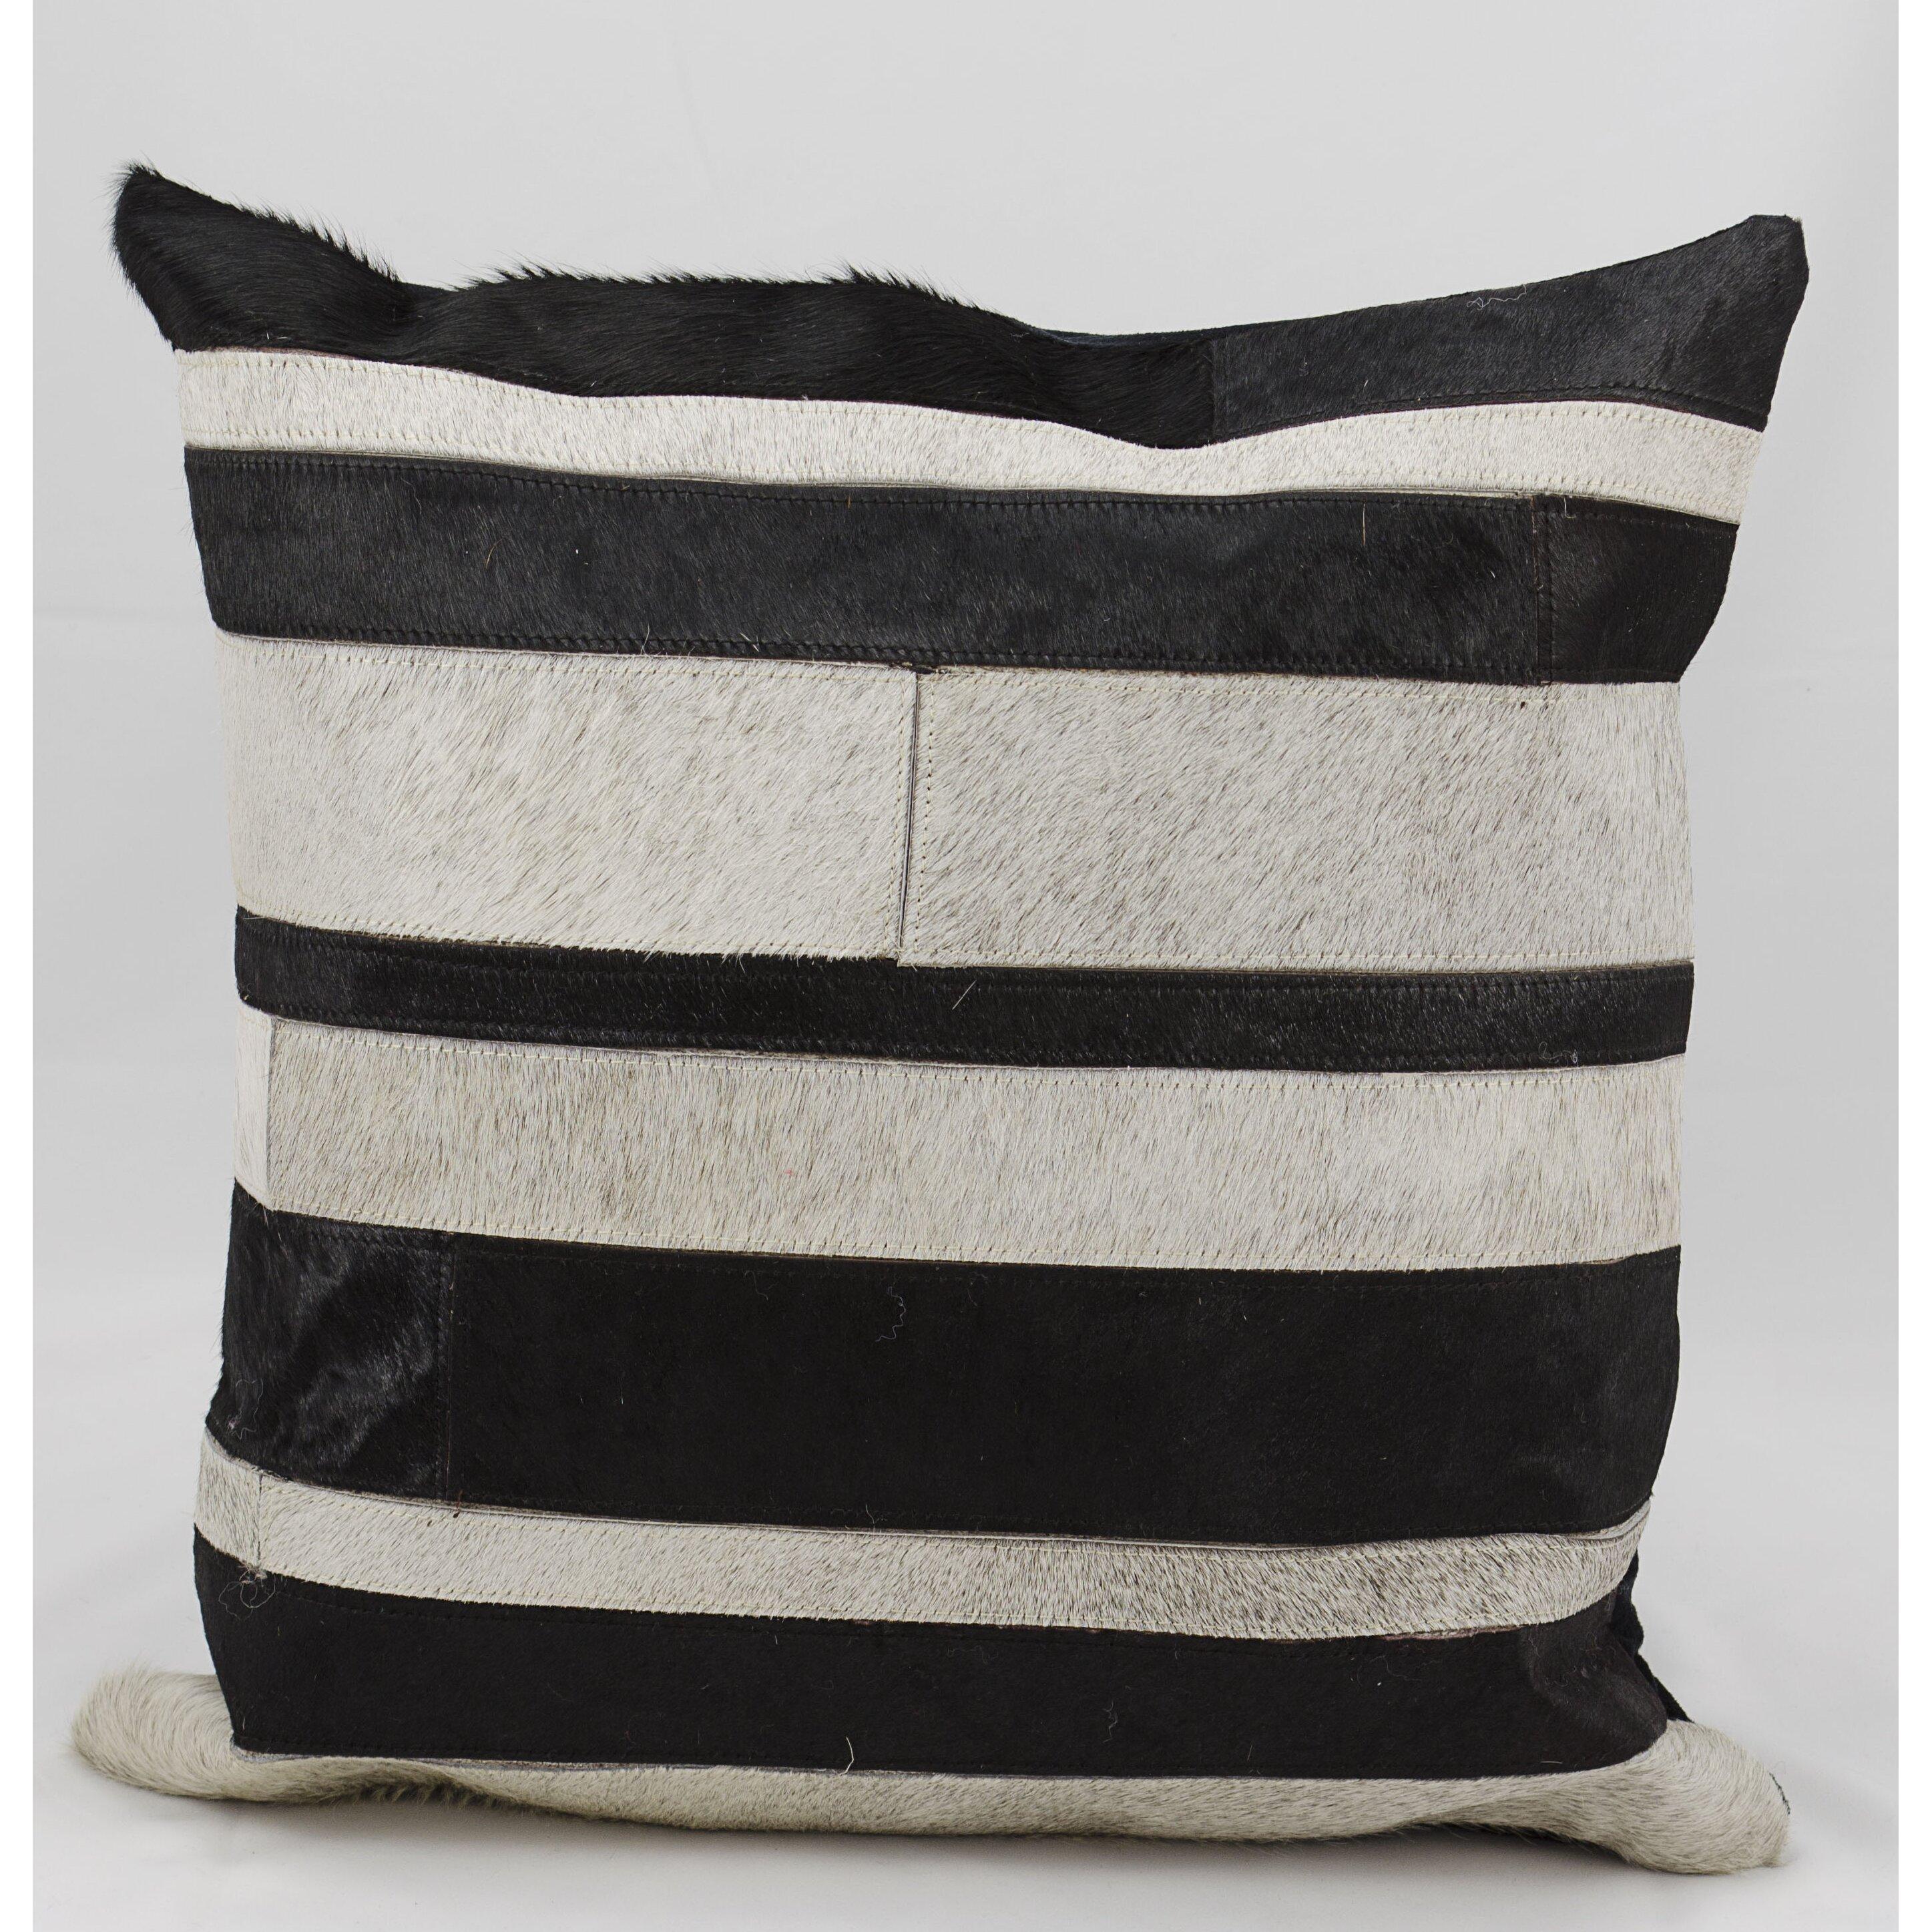 Throw Pillow Leather : Trent Austin Design Creekbluff Natural Leather Hide Throw Pillow Wayfair